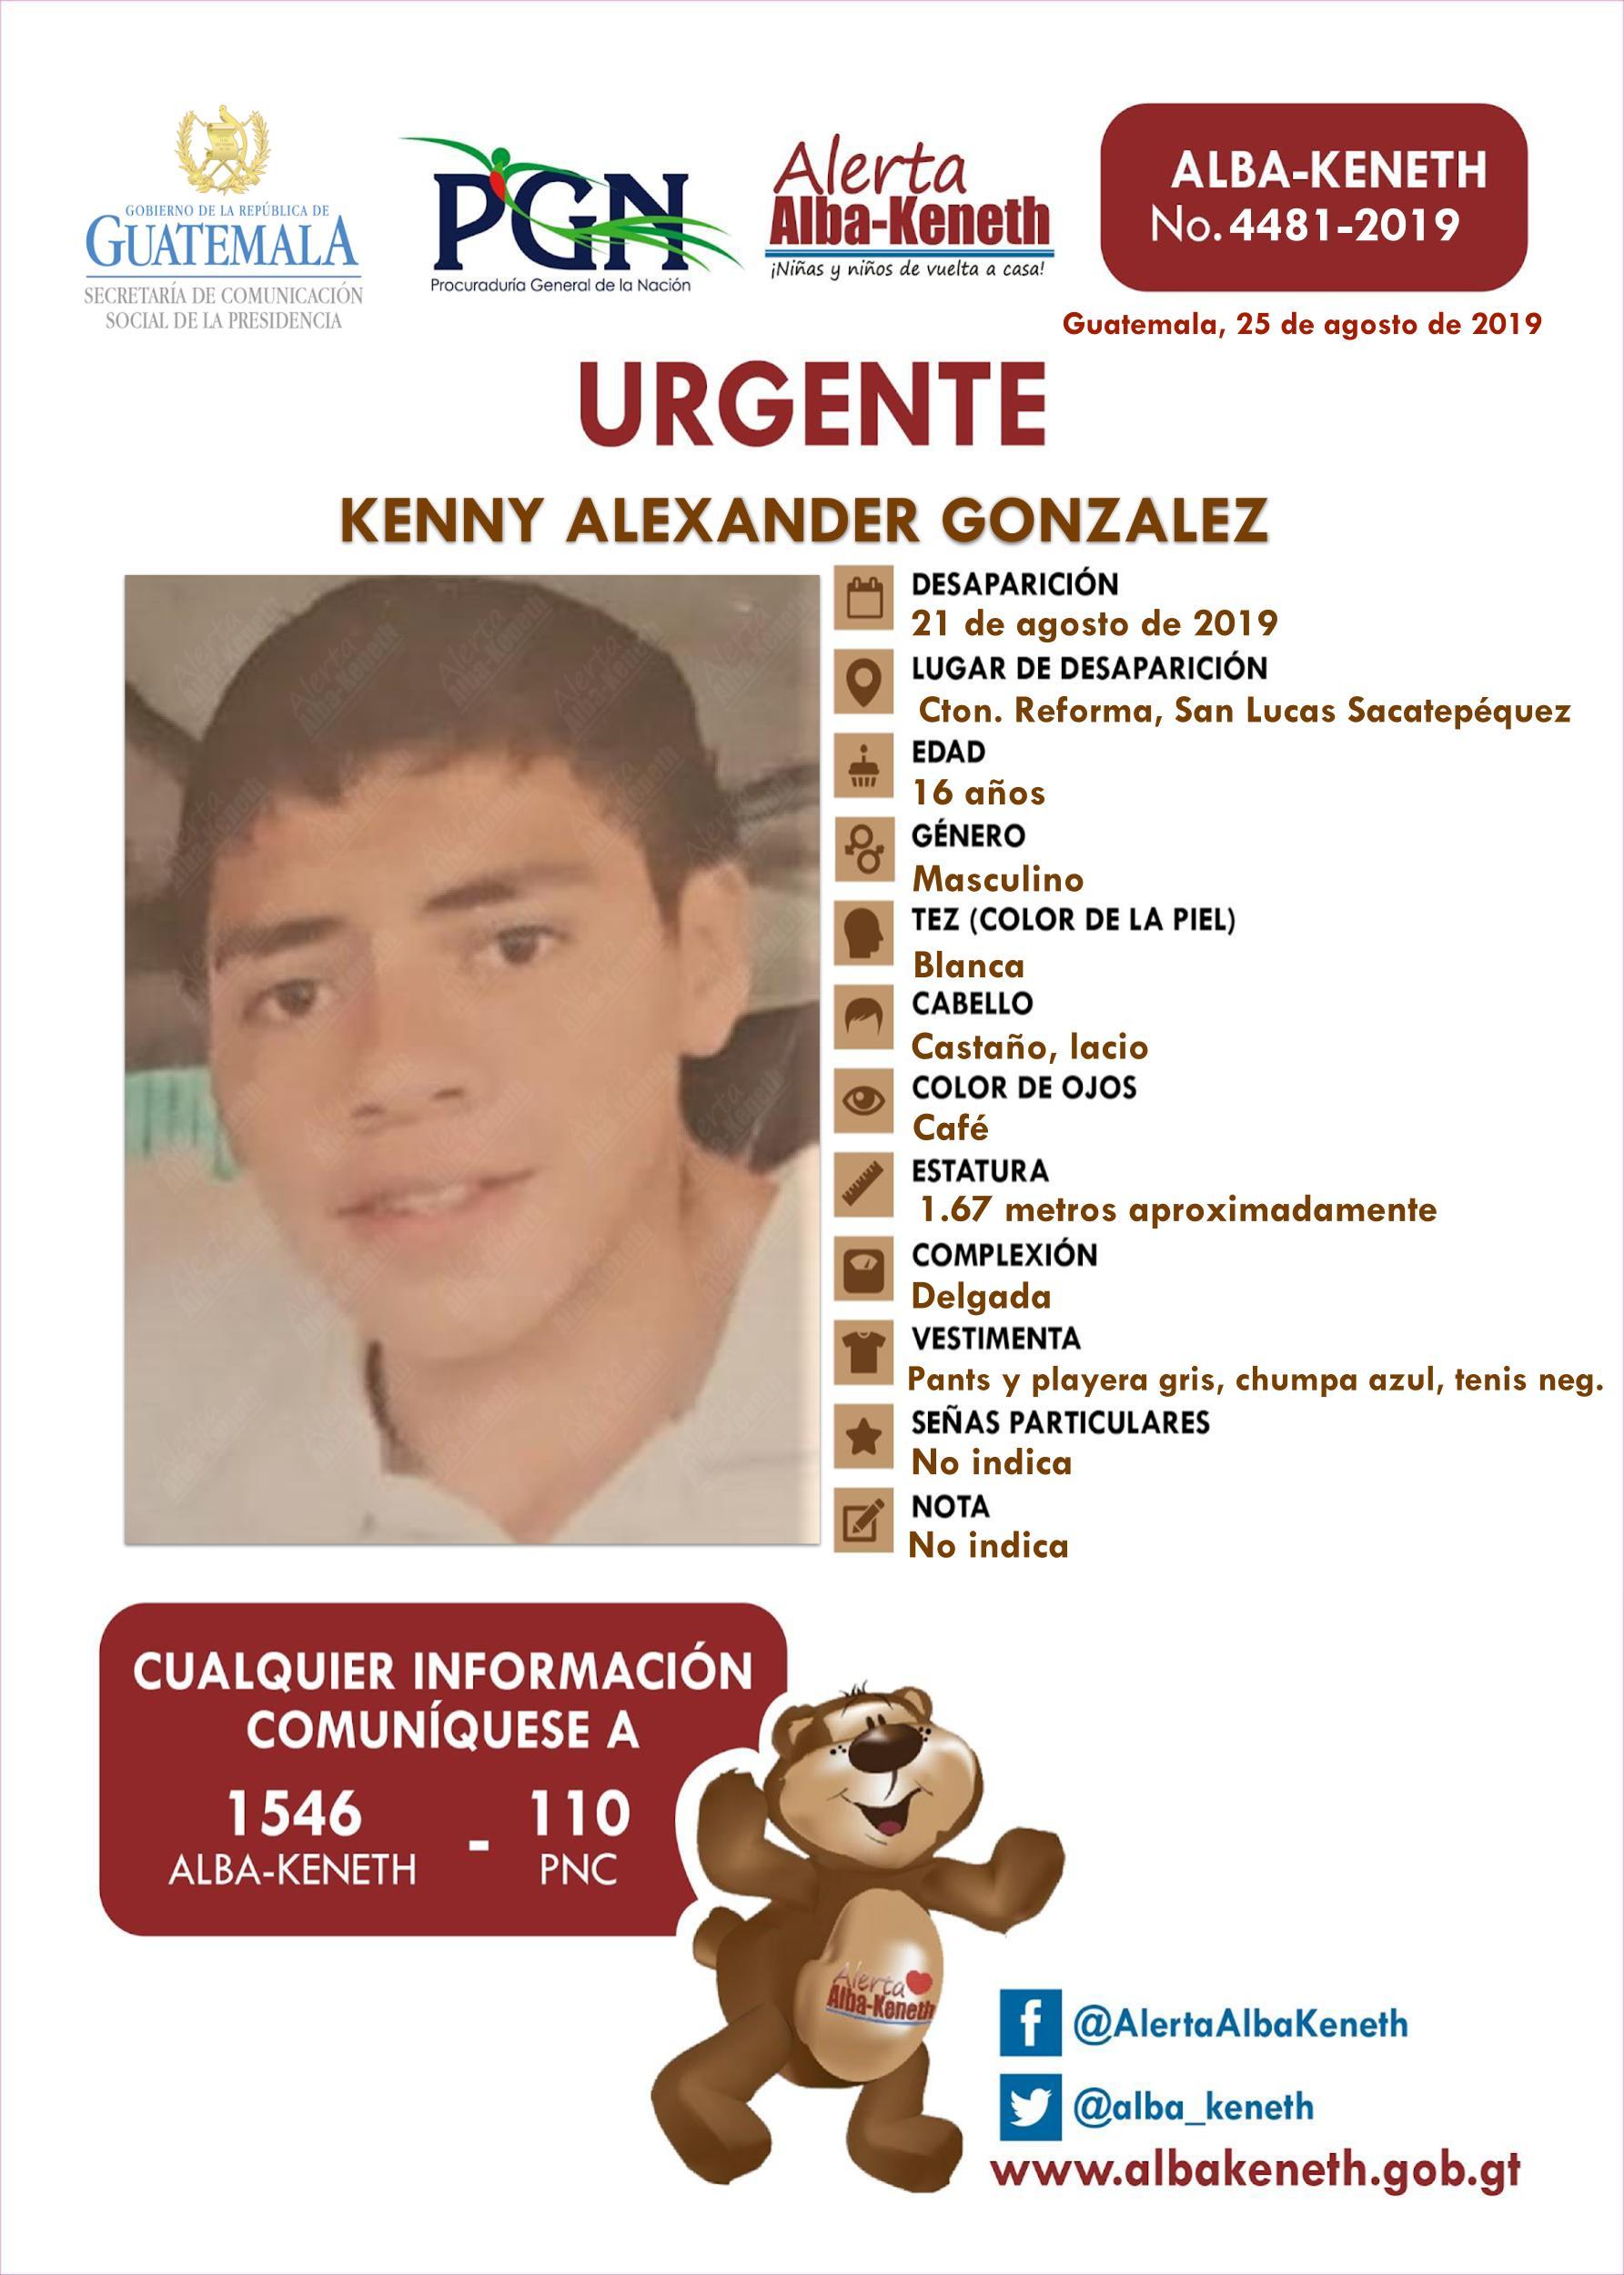 Kenny Alexander Gonzalez